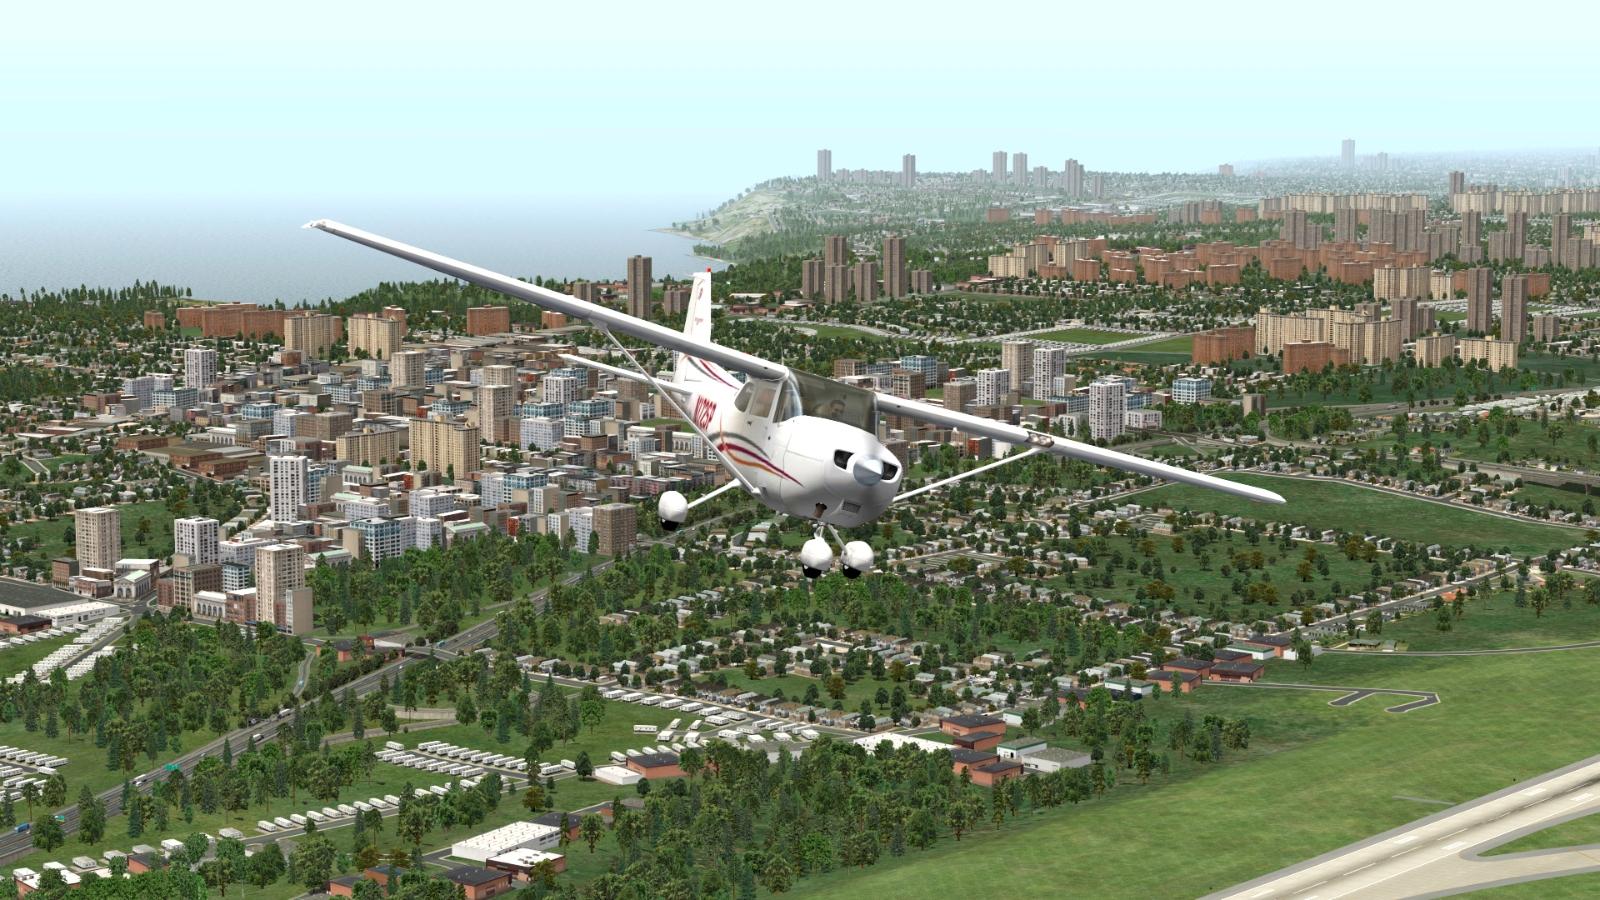 X-Plane 10 Global - 64 Bit - North America Scenery on Steam